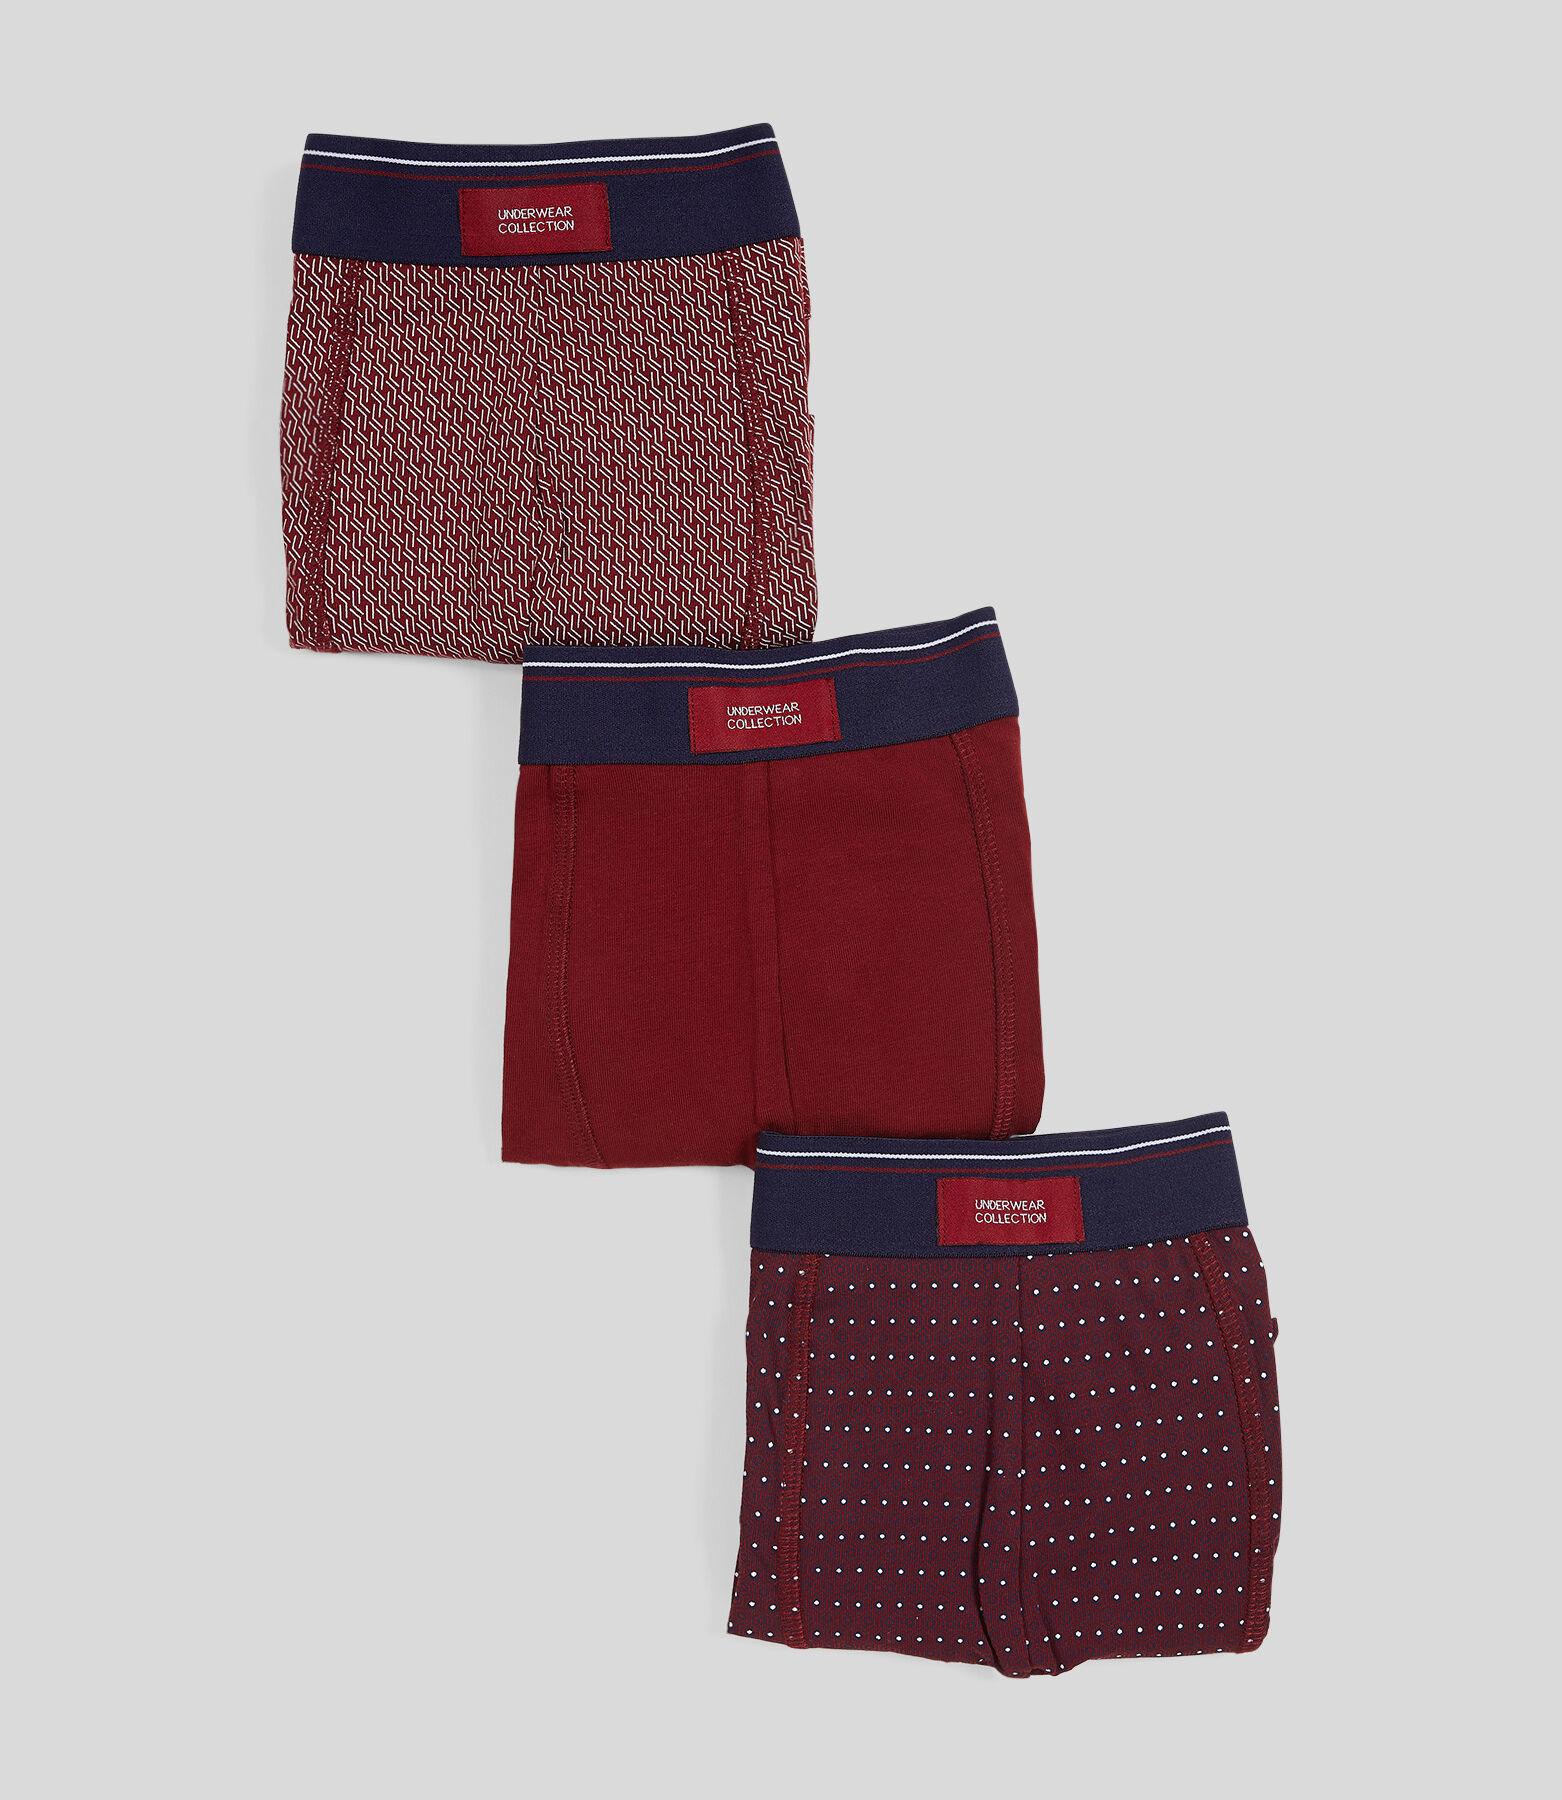 Set van 3 boxers